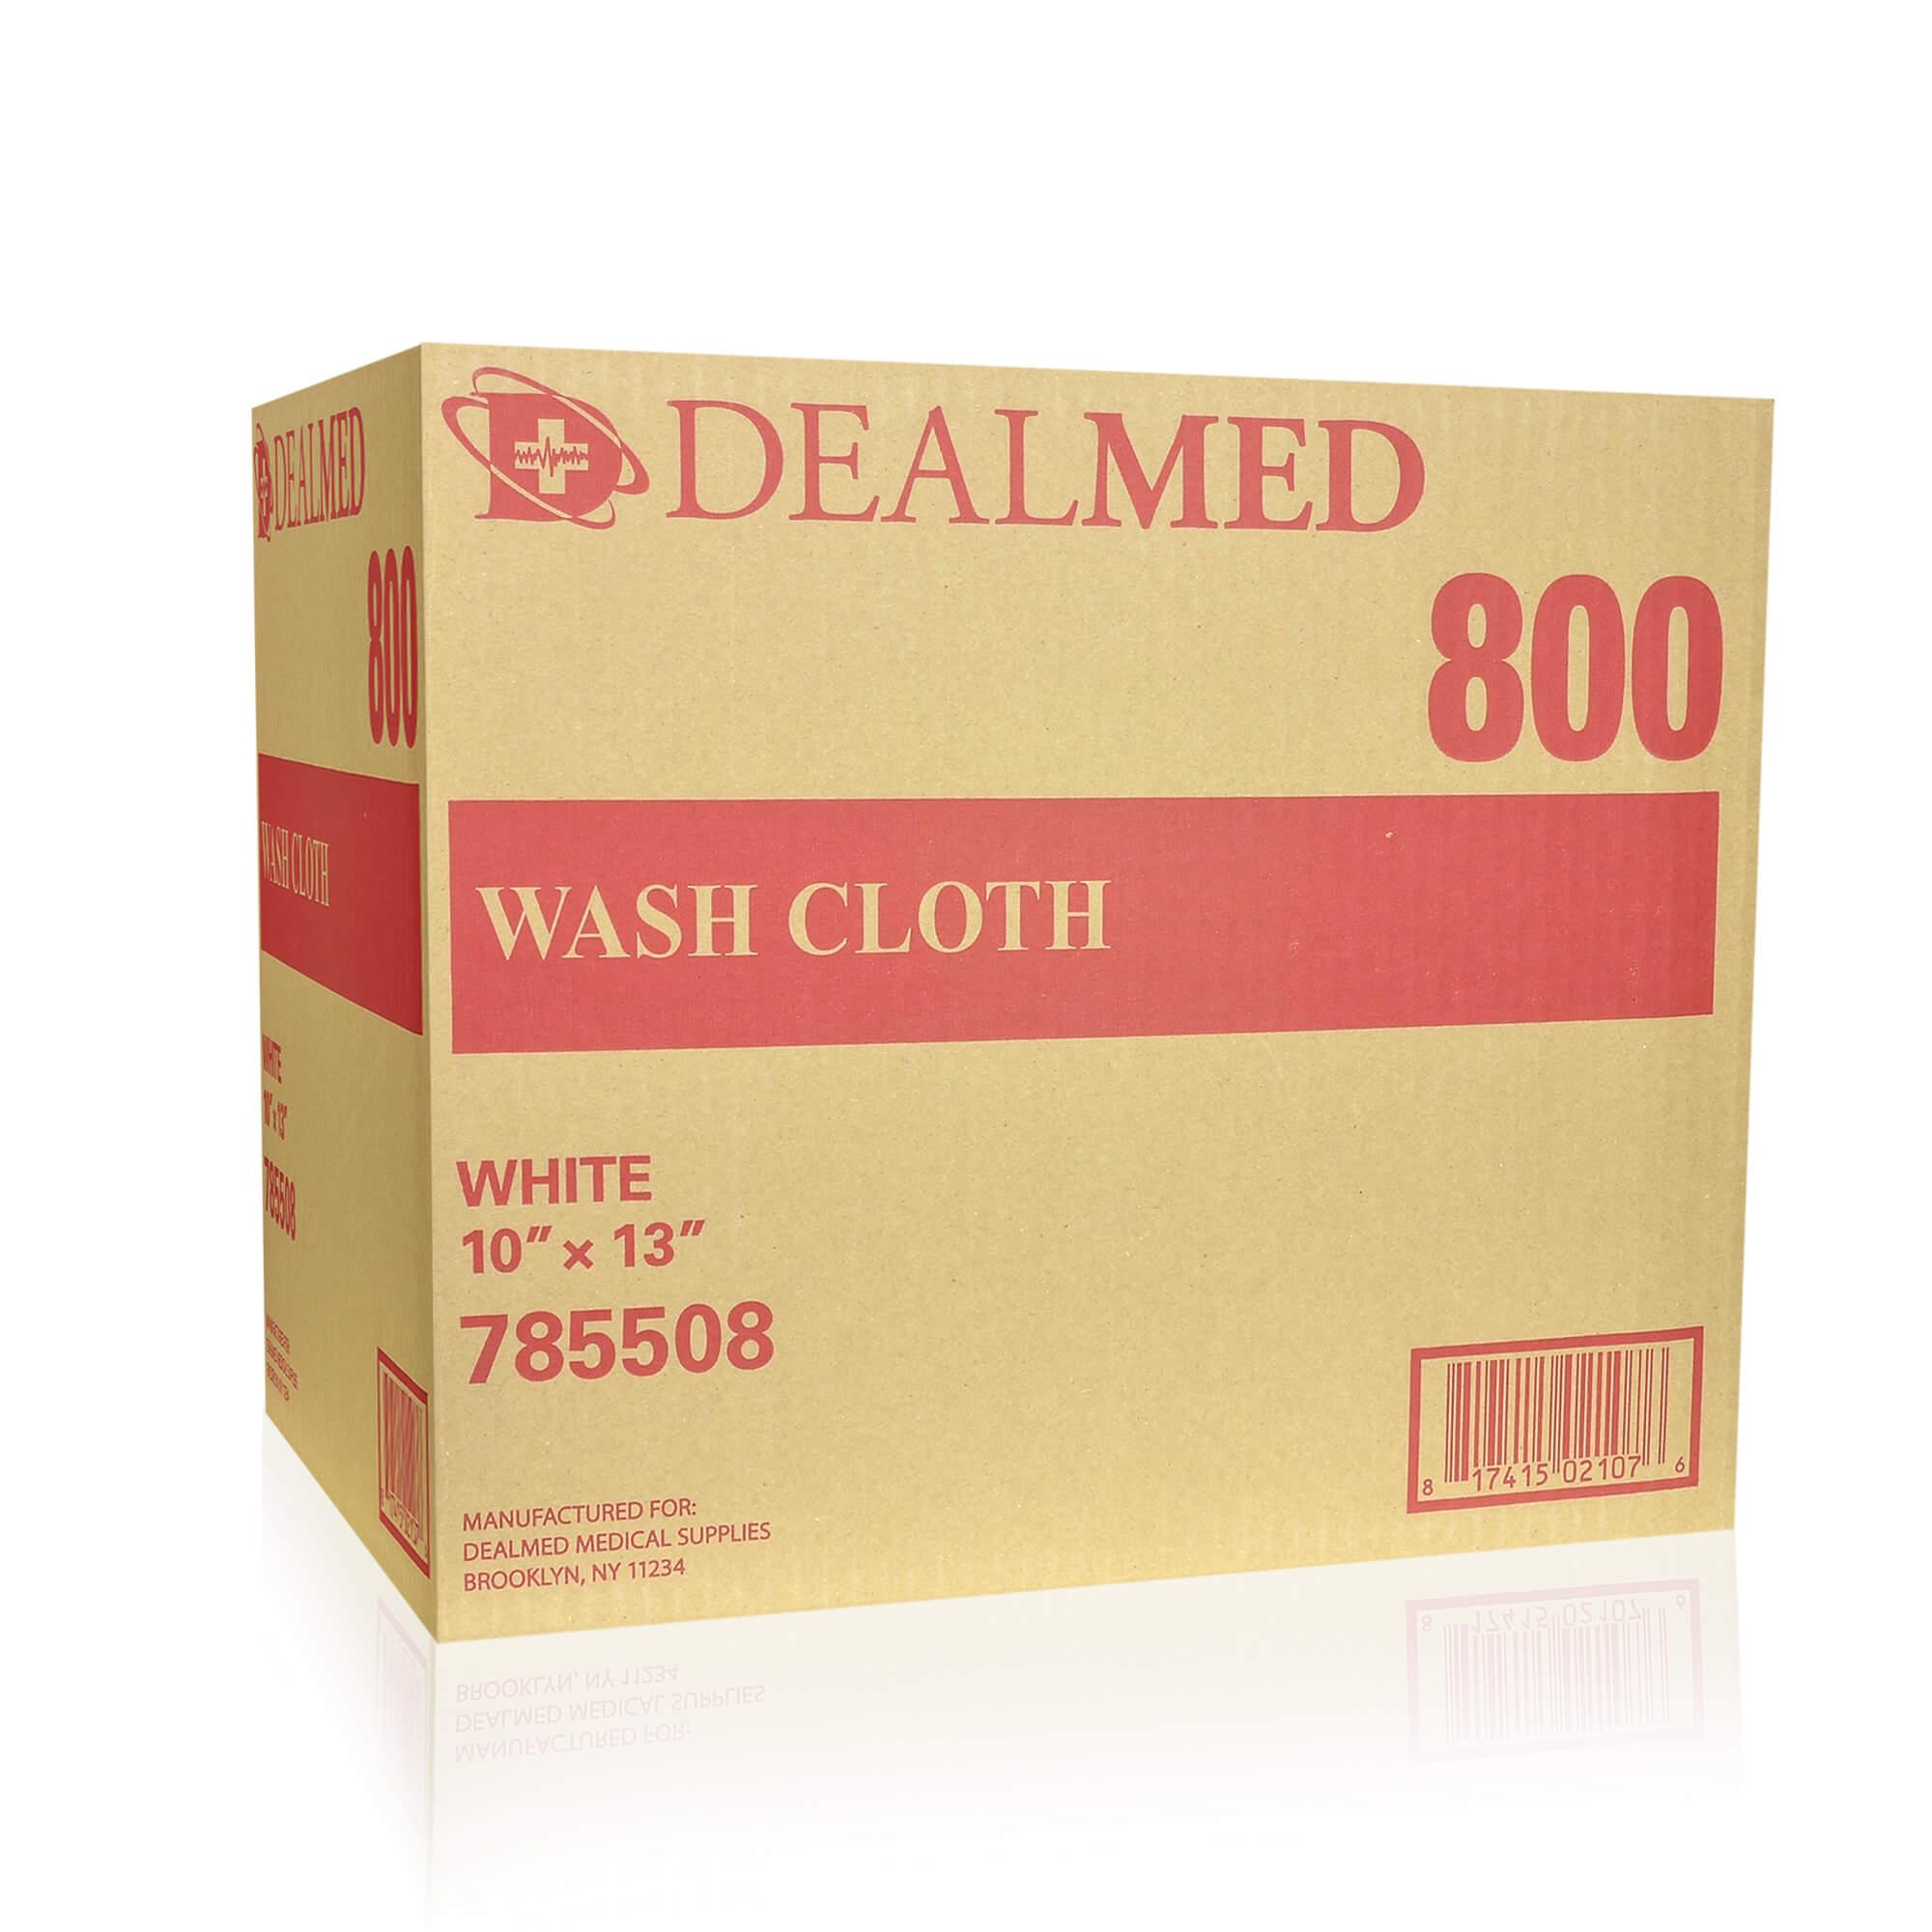 "Washcloth Dry Airlaid 10"" x 13"", 800/Cs"